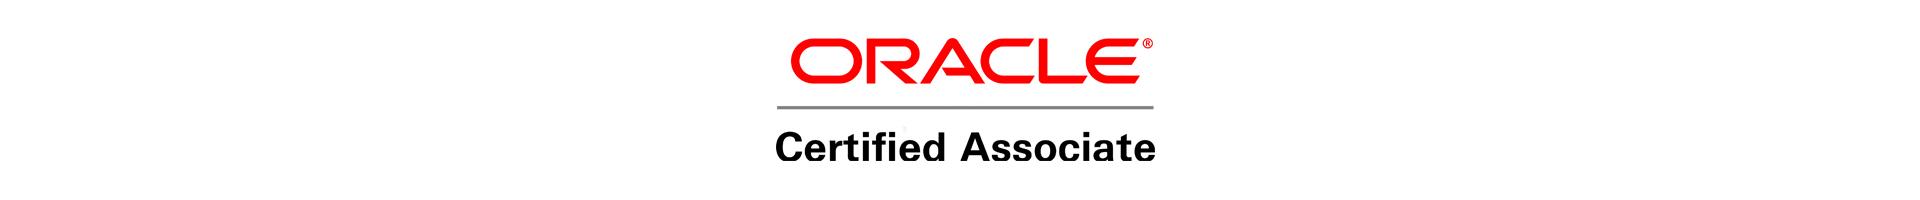 Becoming an Oracle Certified Associate Java Programmer - OCAJP